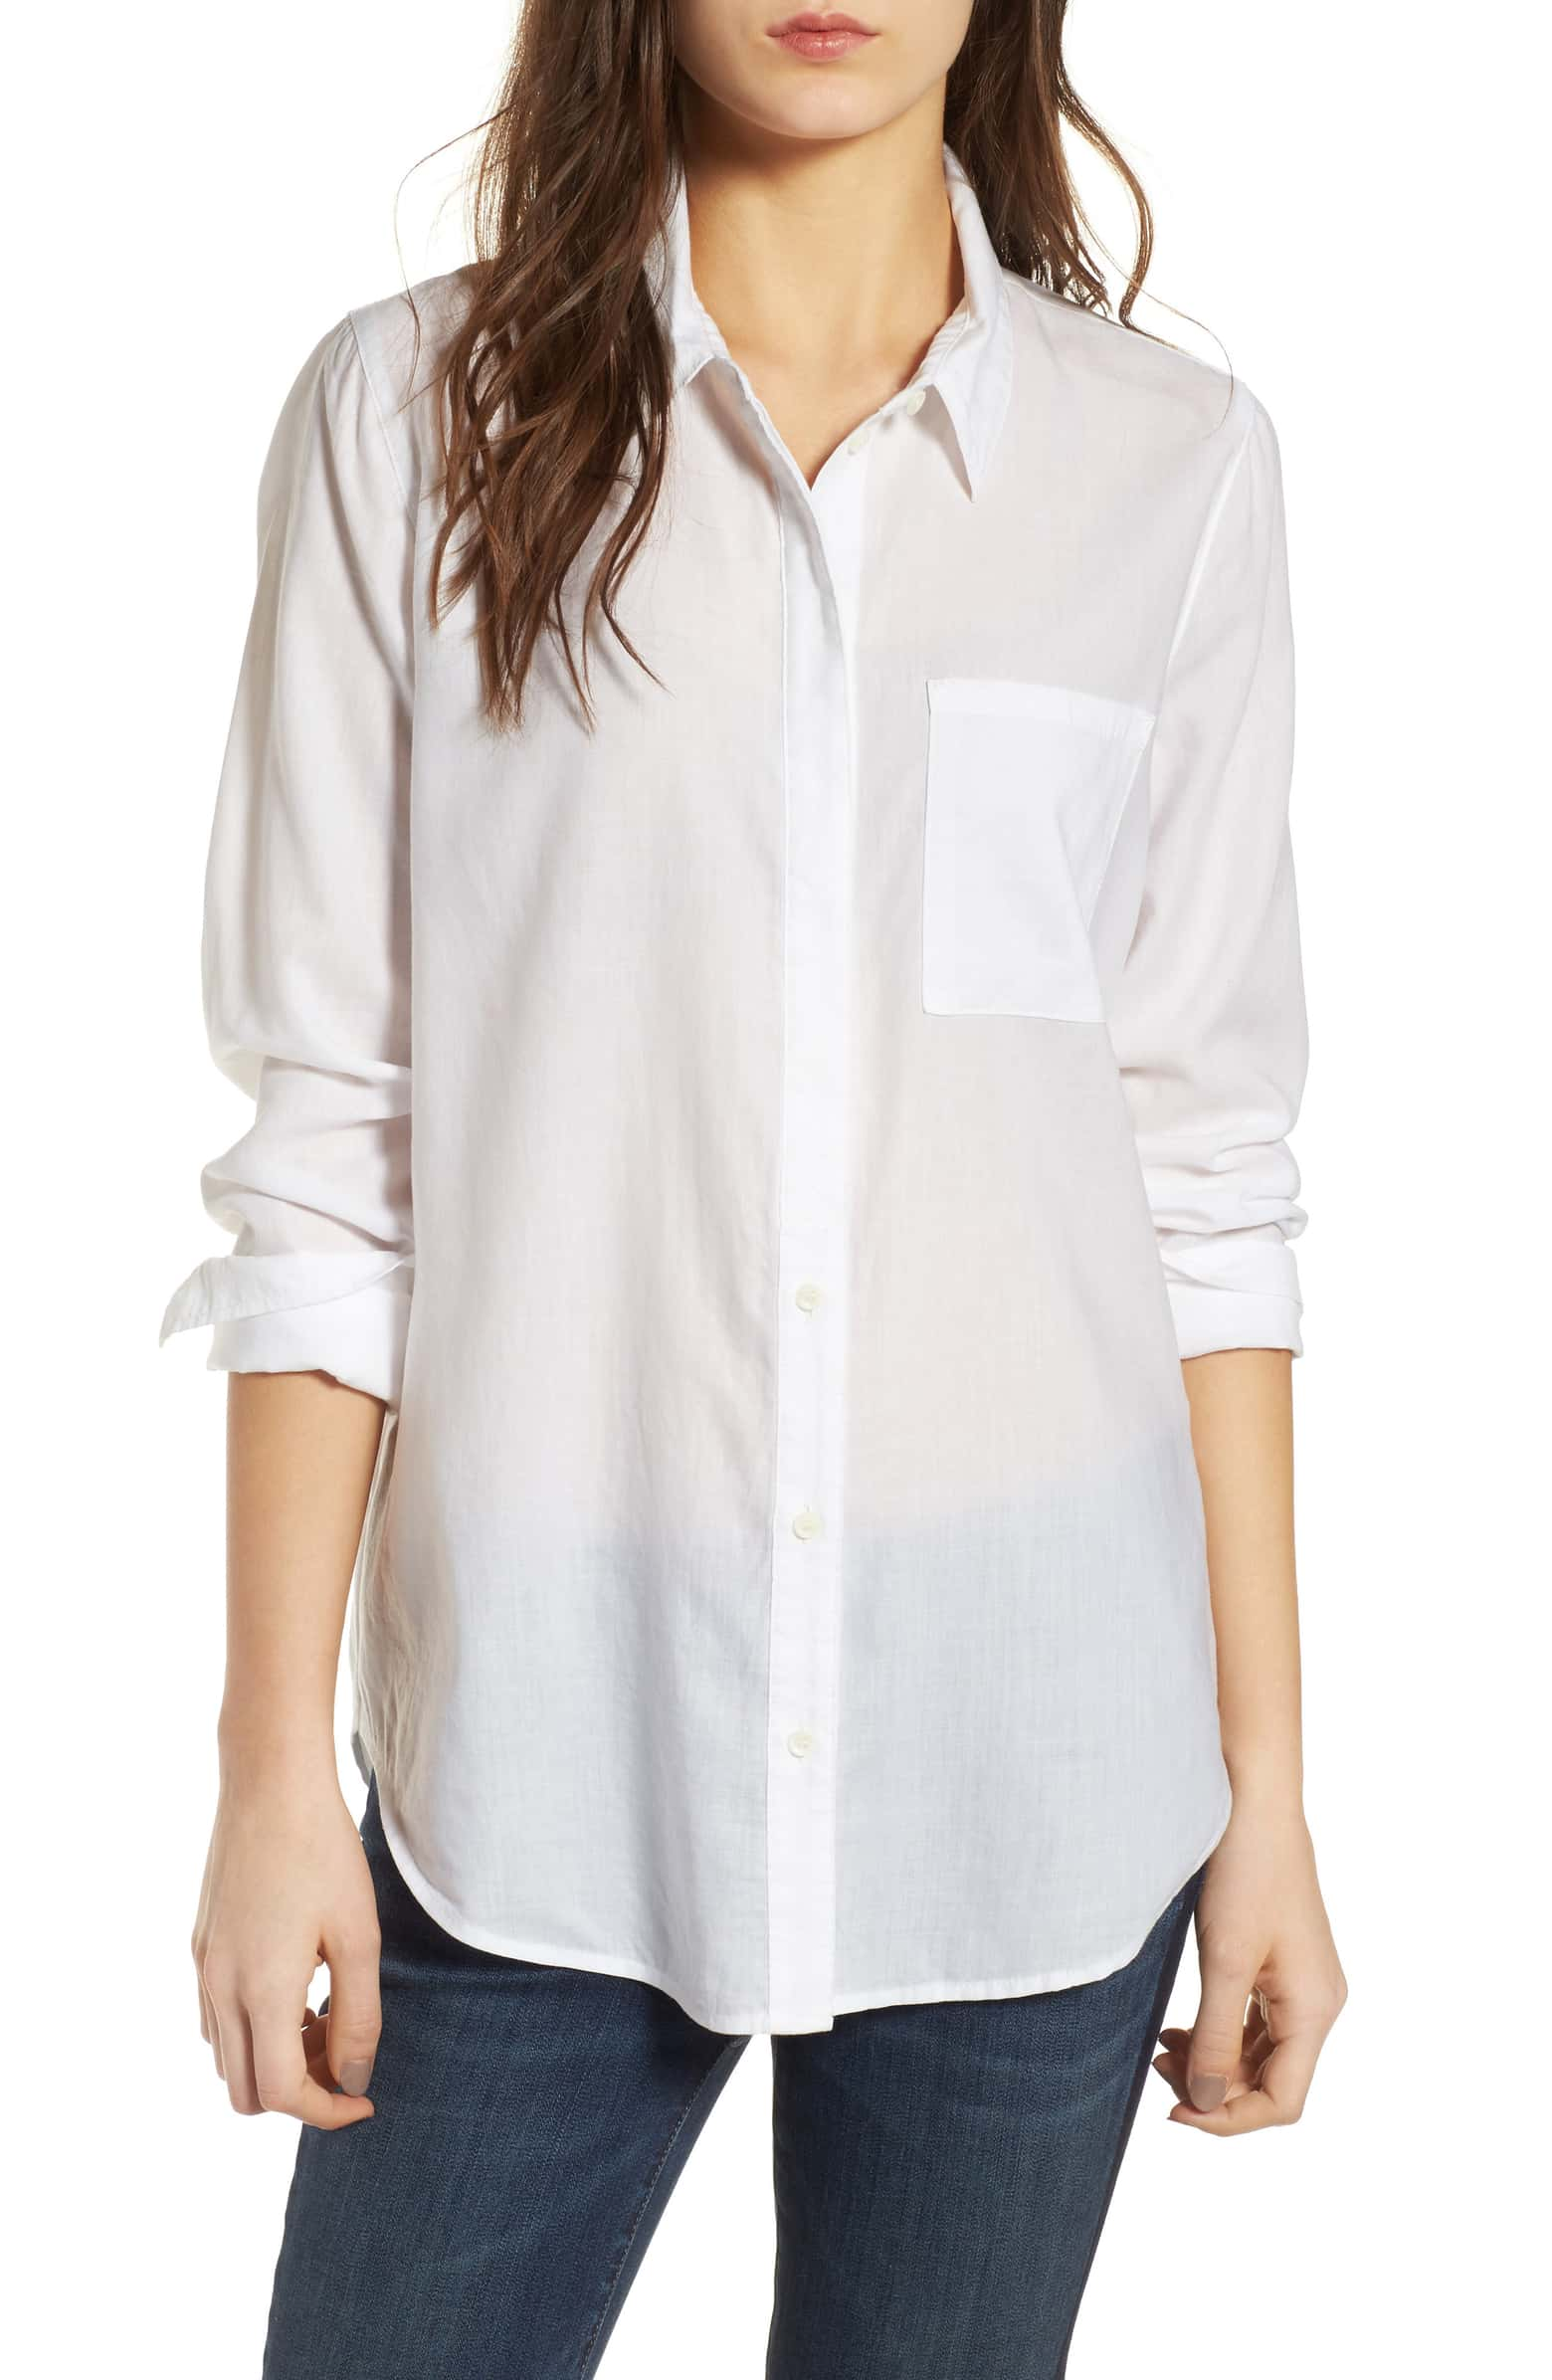 841f41283 Shop Best White Button Down Shirts - Women's Clothing